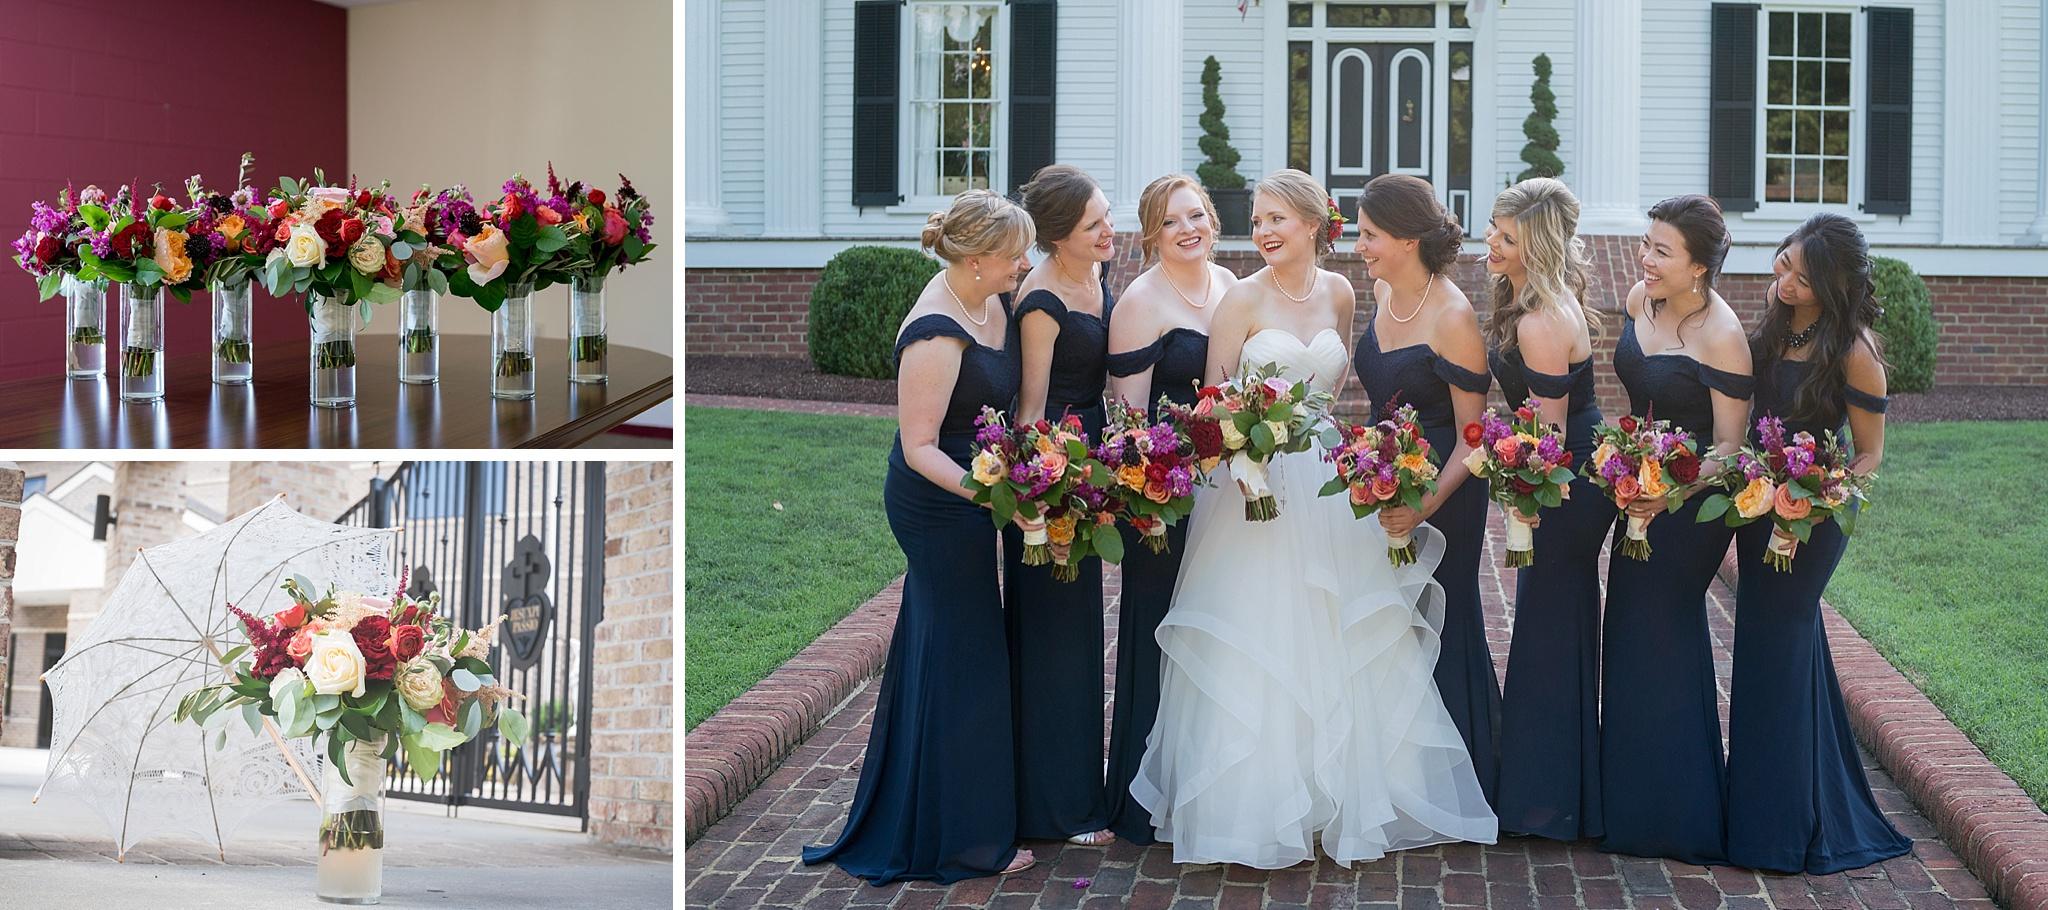 Raleigh-NC-Wedding-Photographers-088.jpg